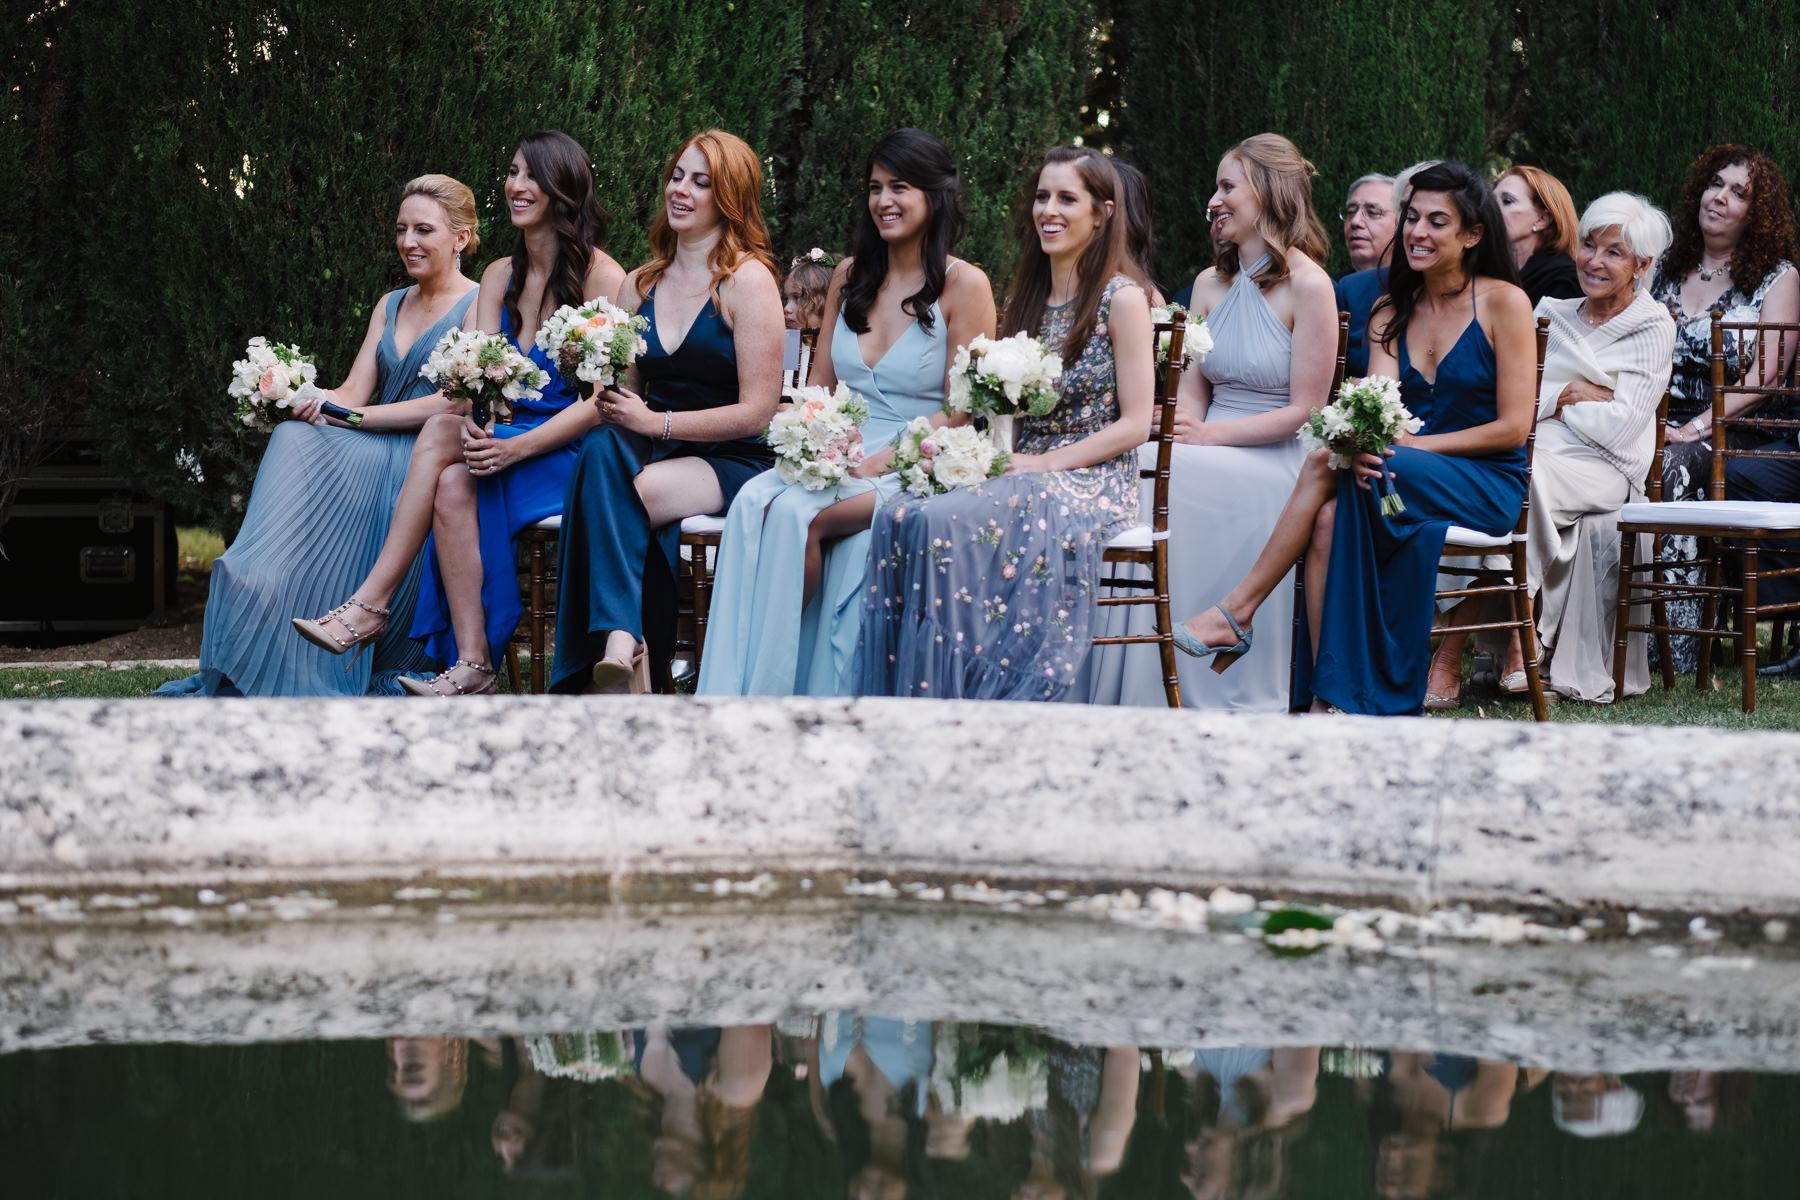 bridemades attending the wedding at la foce